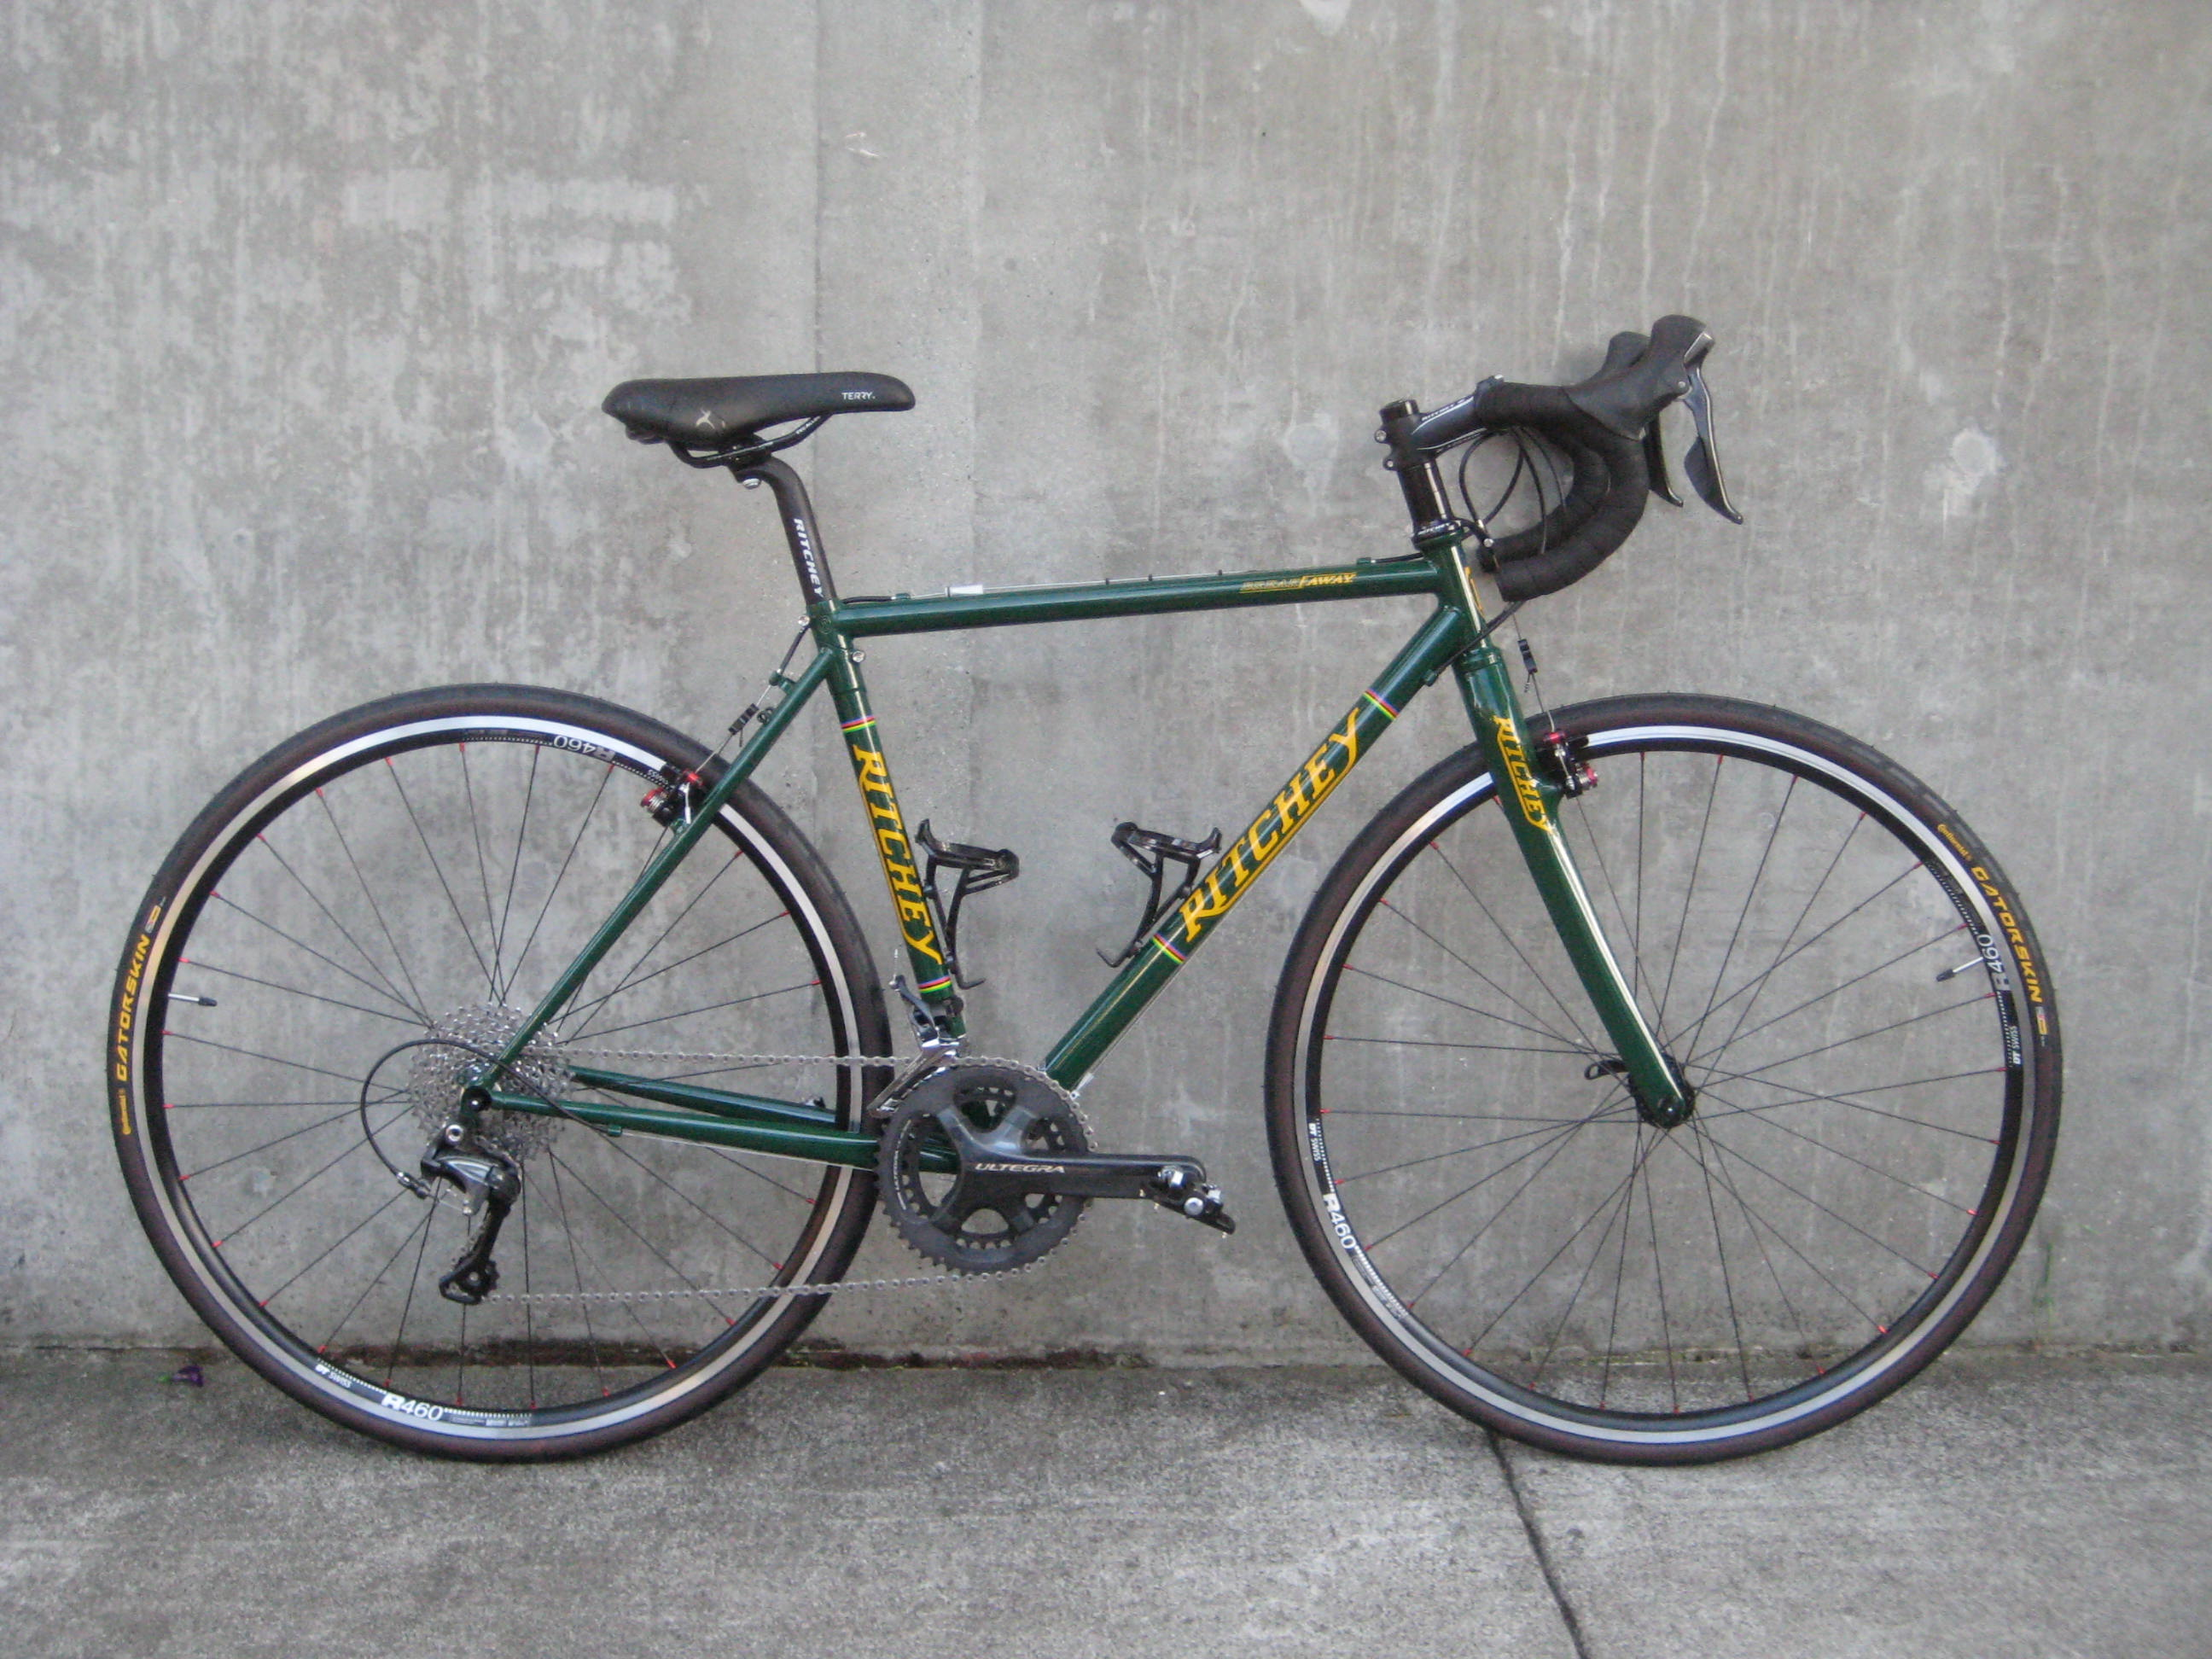 Ritchey bike frames for sale | Classic Cycle Bainbridge Island ...